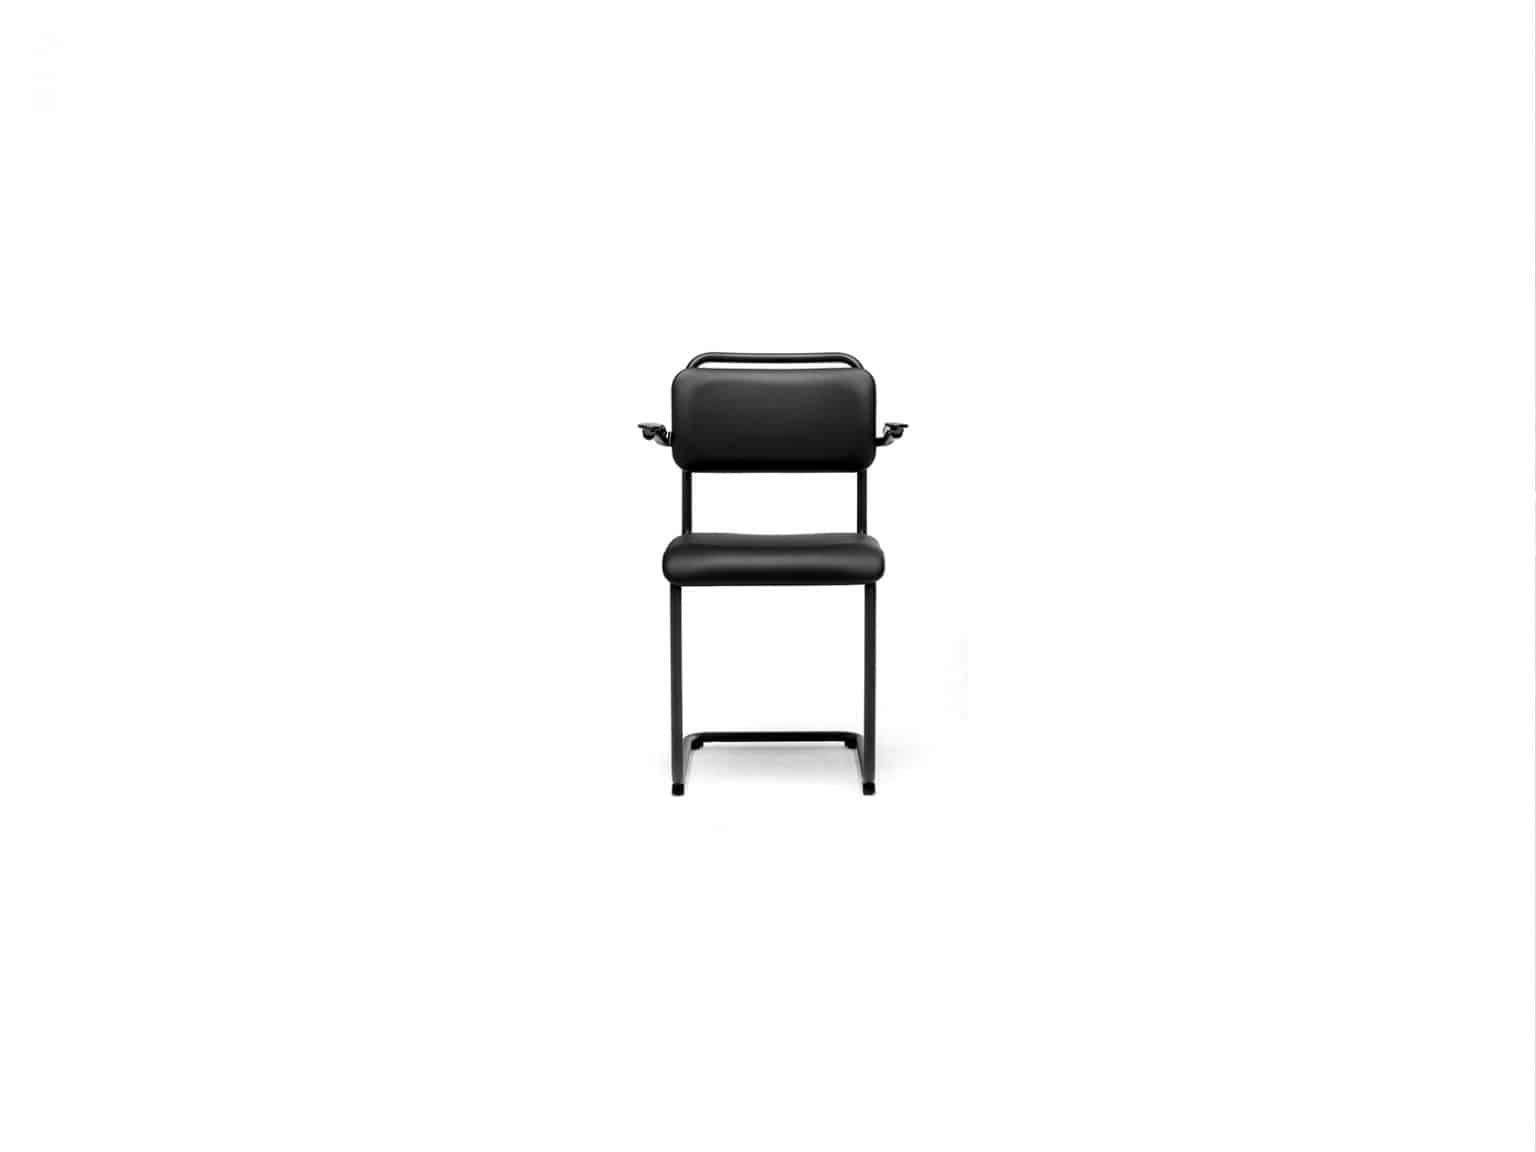 Dutcho Originals fauteuil Gispen 201XL pa